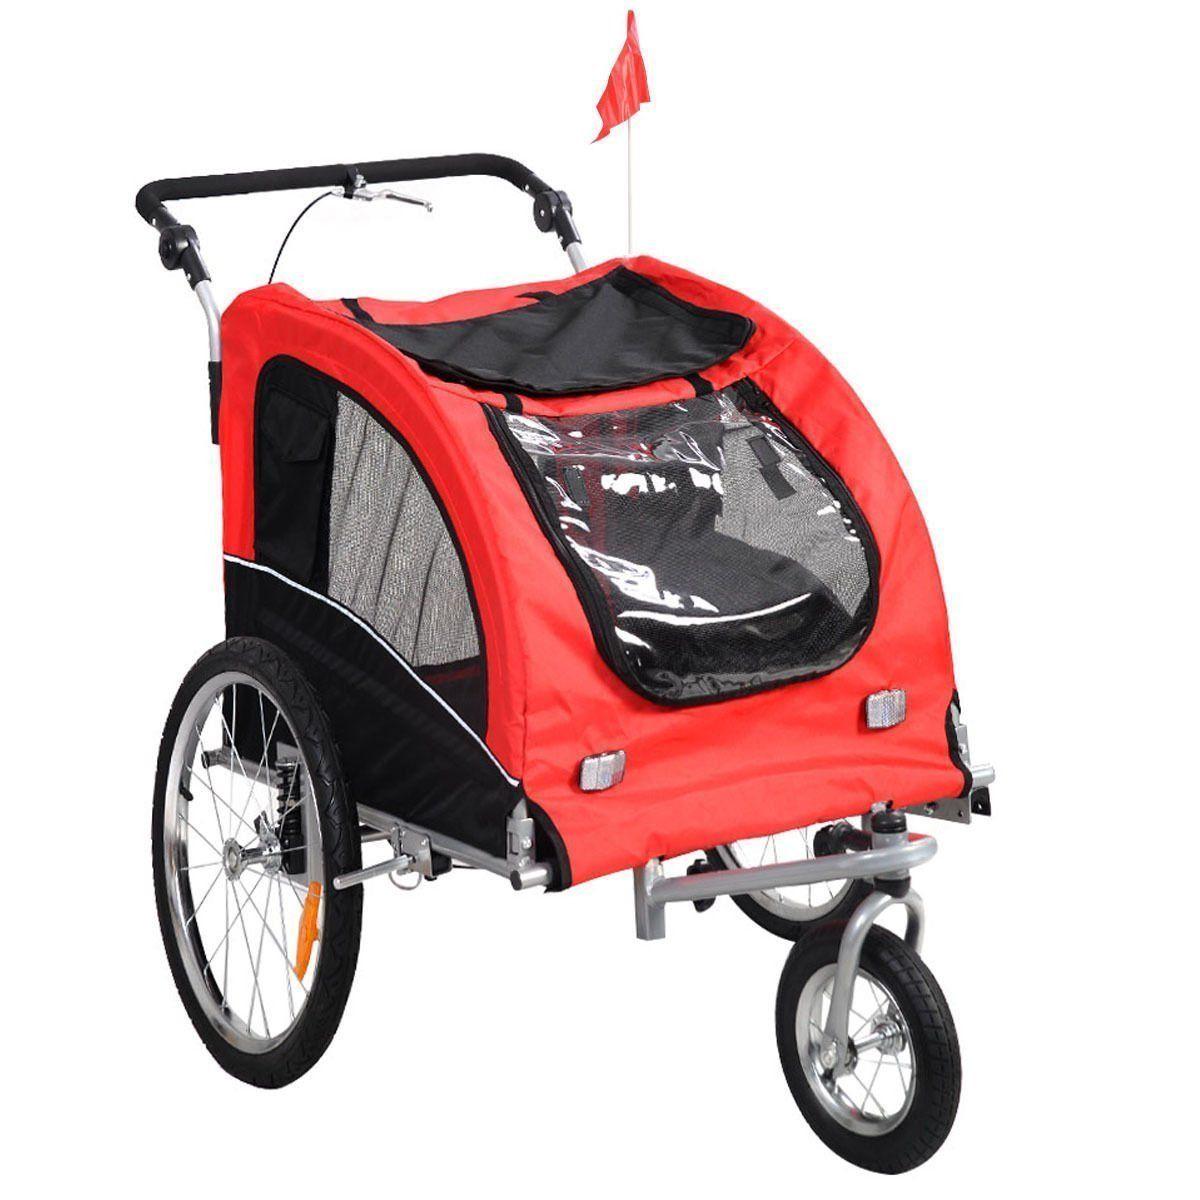 Giantex Pet Dog Bike Trailer Bicycle Trailer Stroller